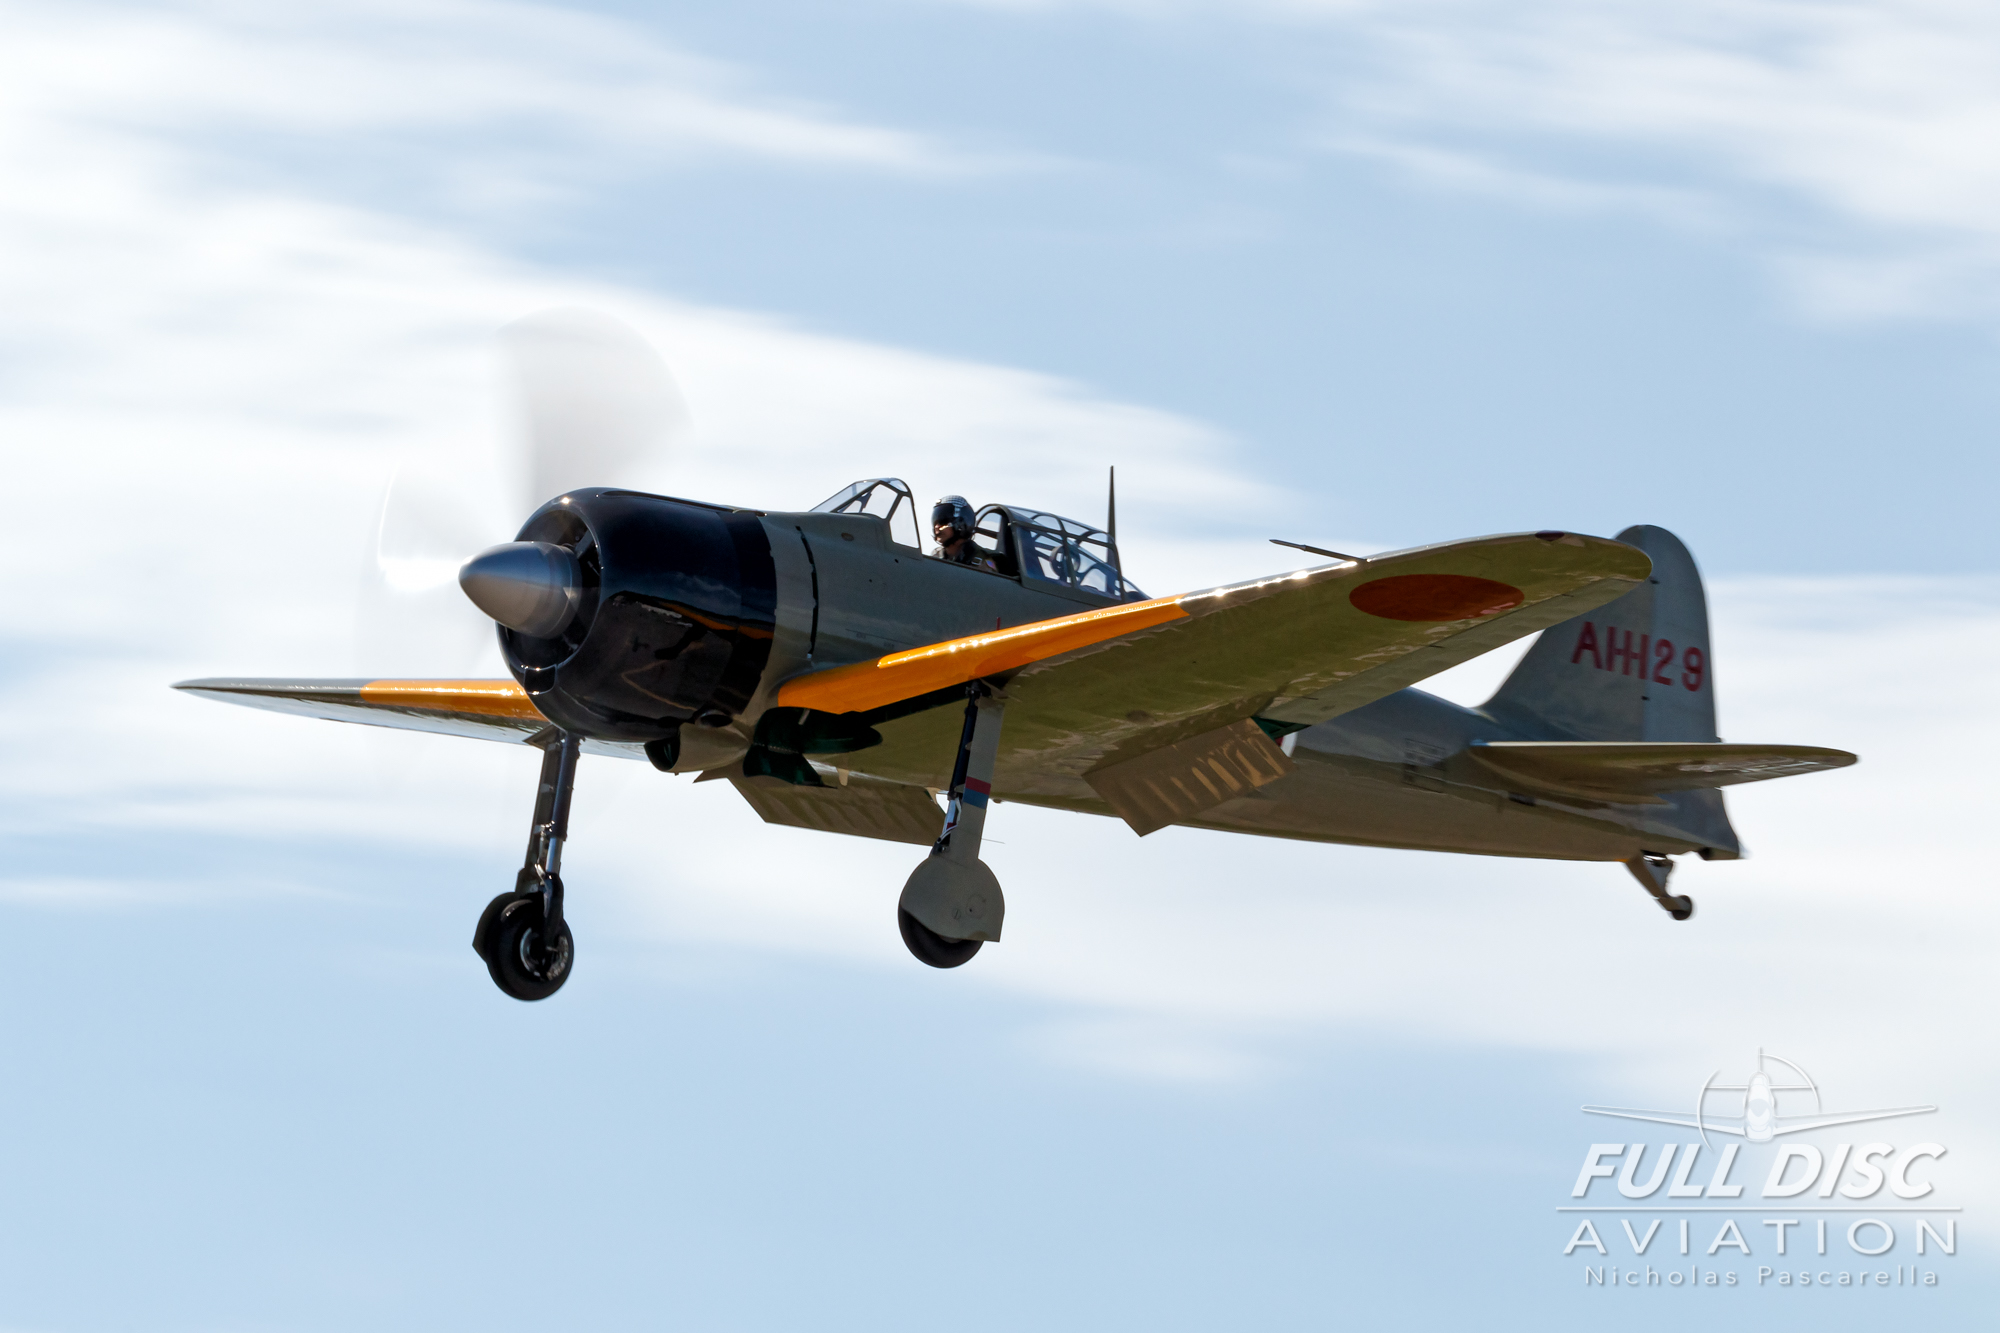 americanairpowermuseum_nicholaspascarella_nickpascarella_fulldiscaviation_legendsofairpower2019_aviation_warbird_zero_japanesezero_zerofighter_landing.jpg